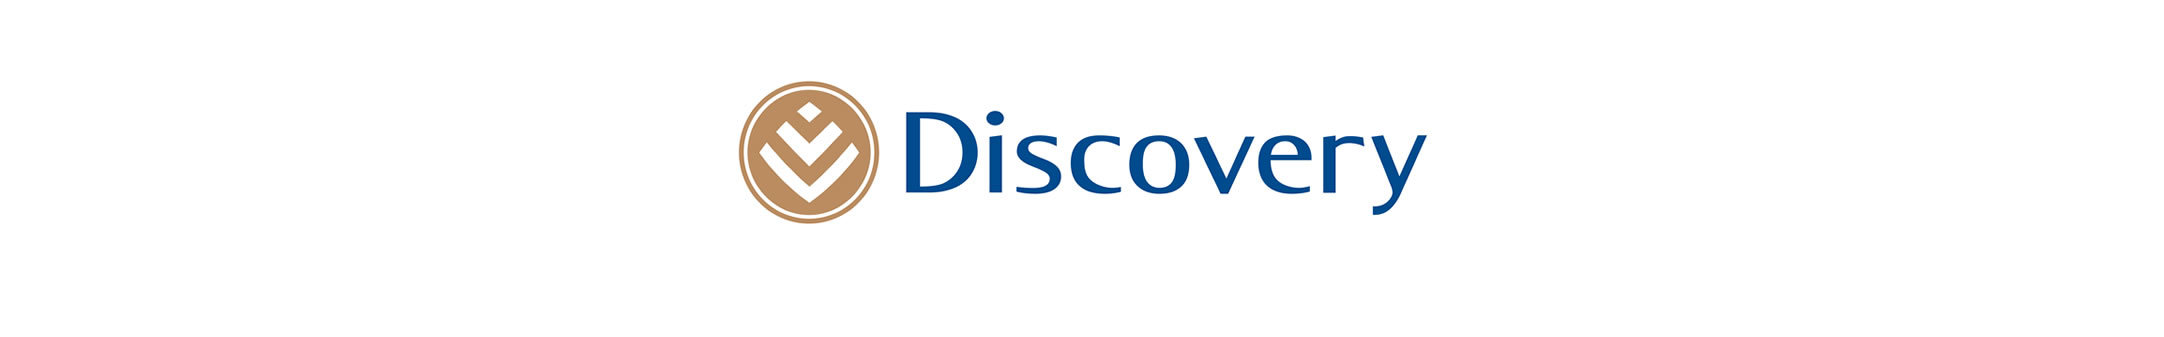 2019-HC-Discovery-Logos.jpg